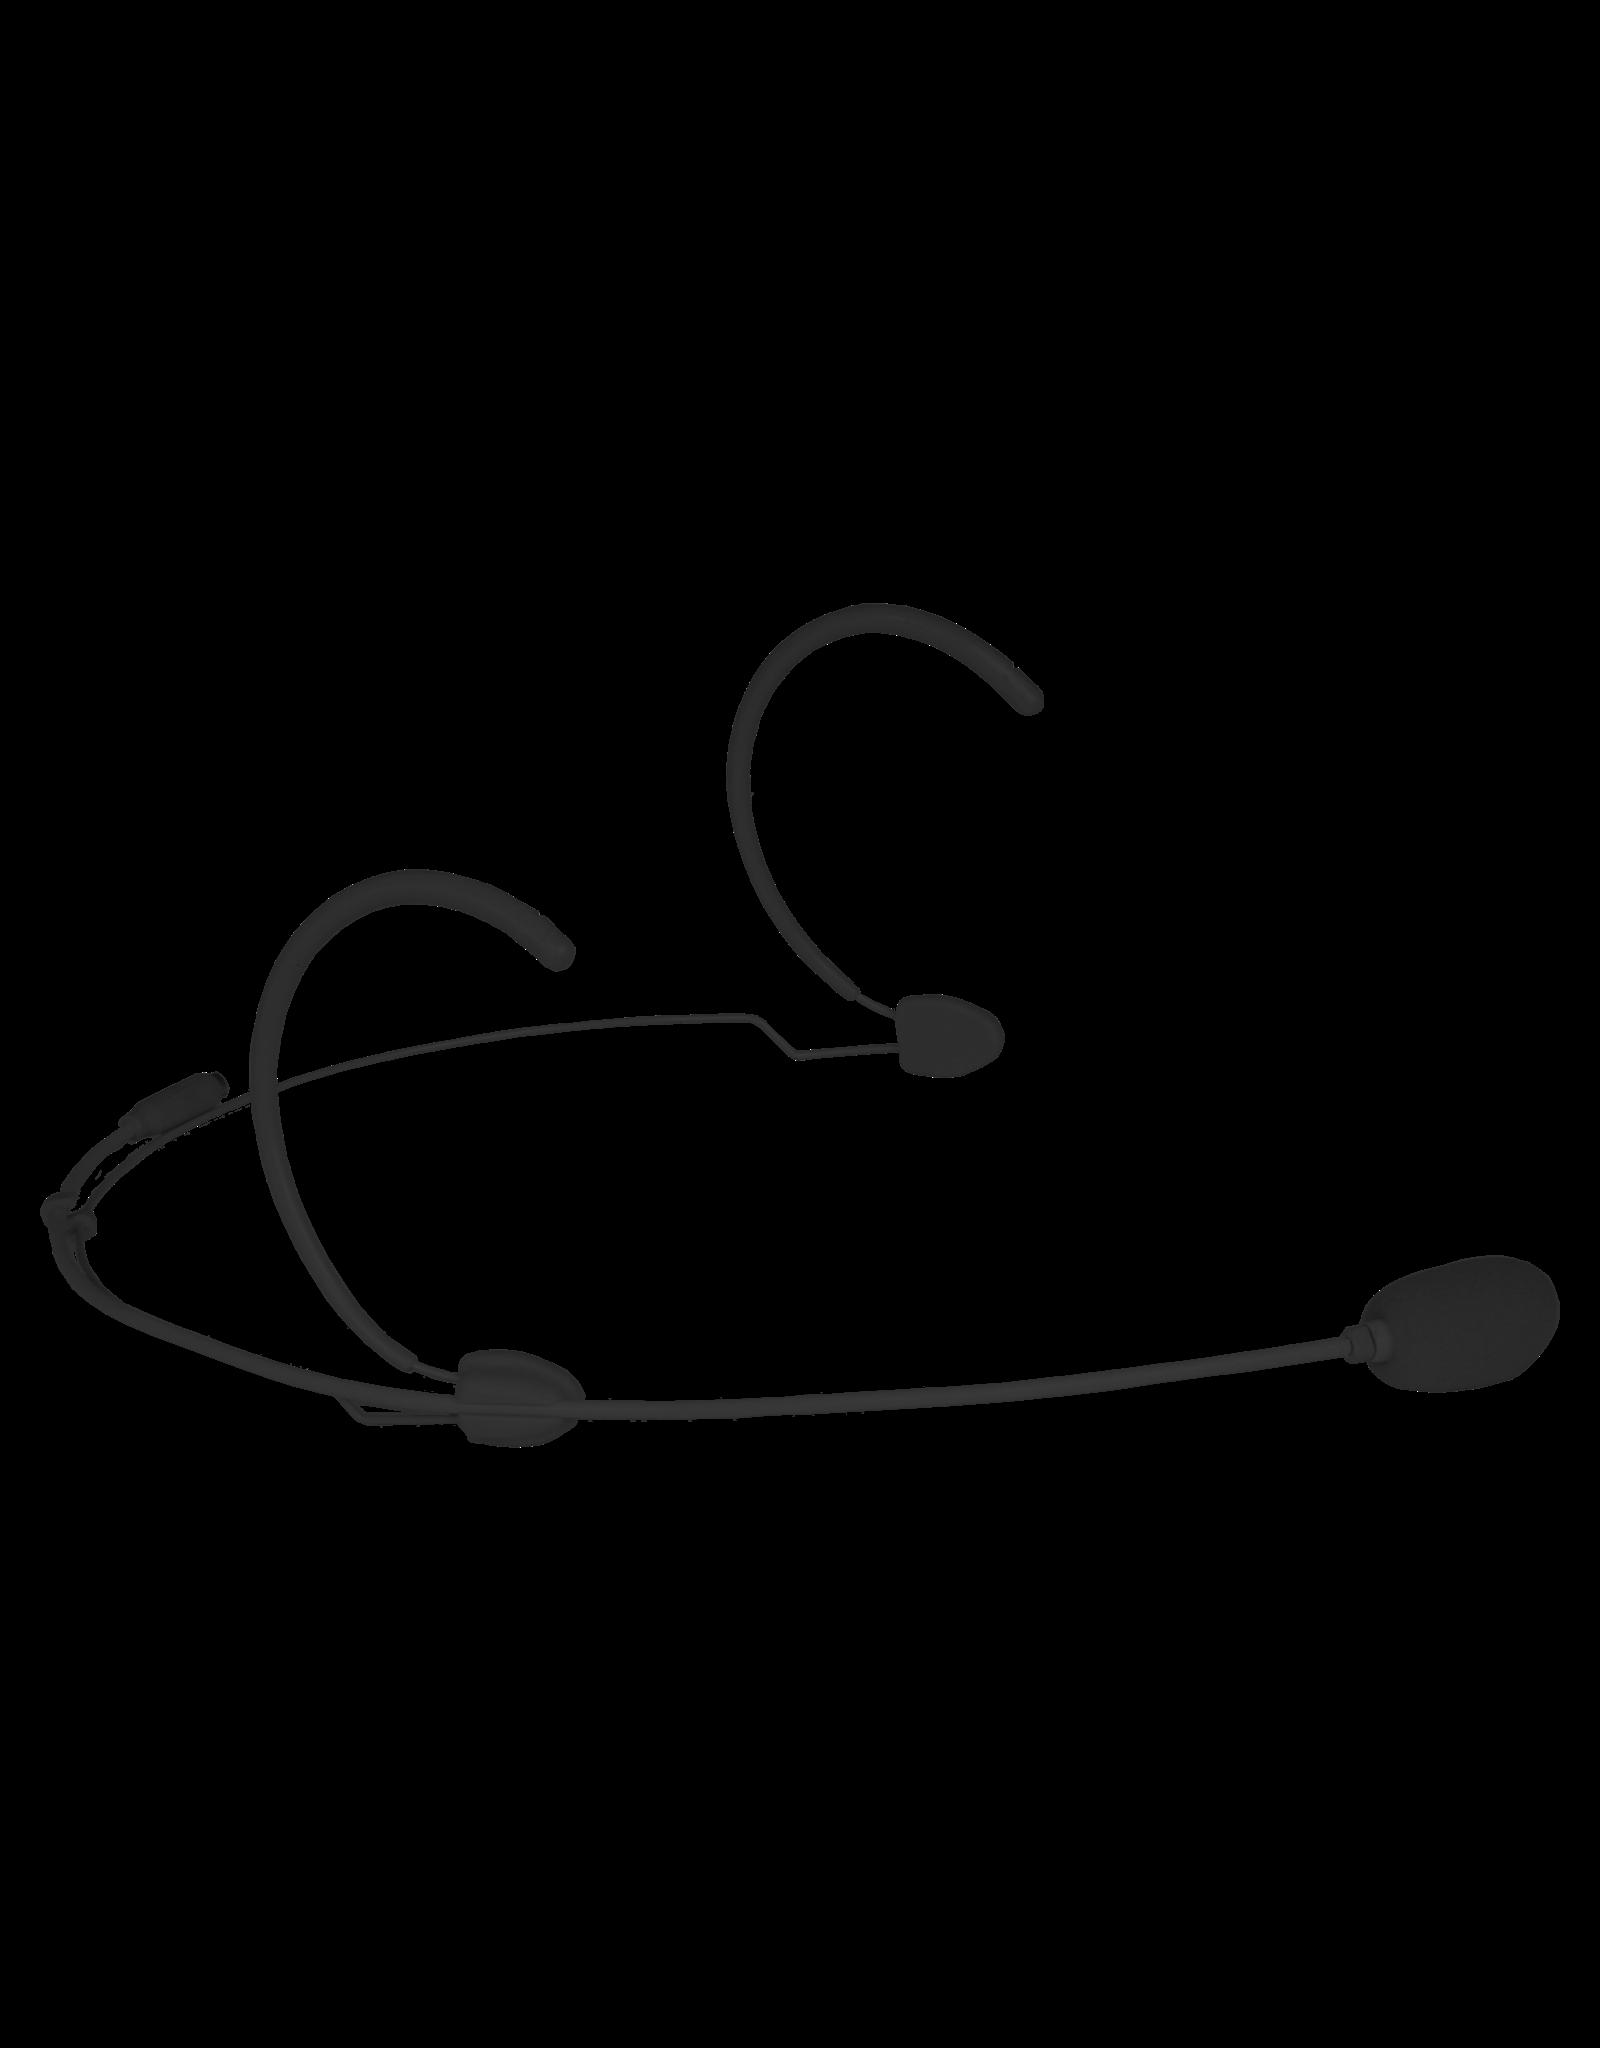 Audac Headset condenser cardioid microphone Black